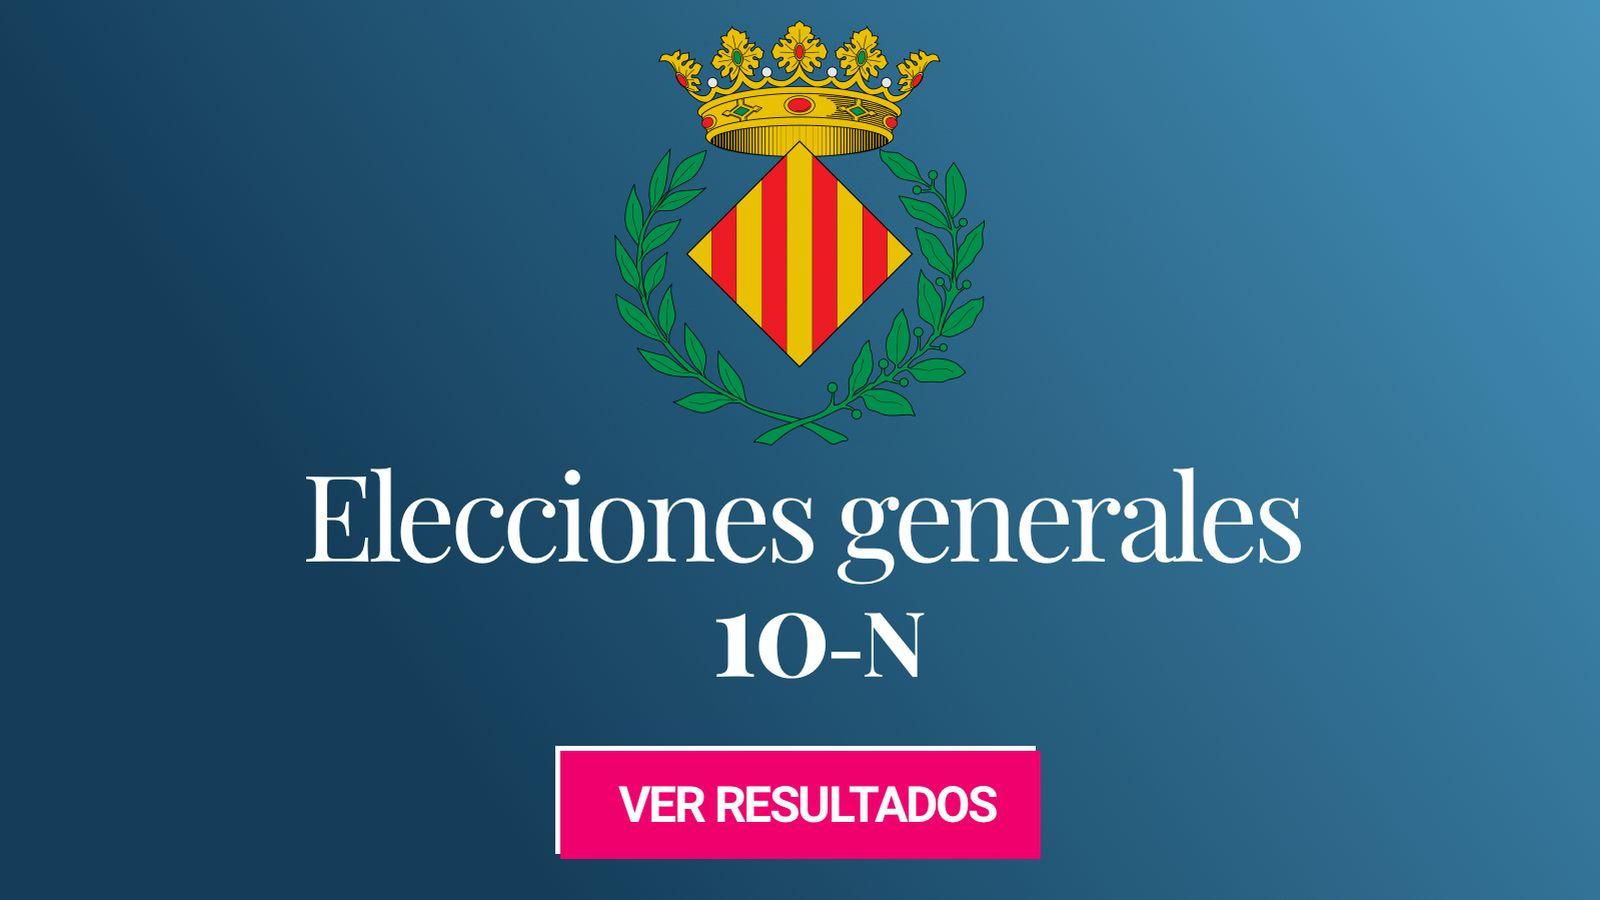 Foto: Elecciones generales 2019 en Villarreal. (C.C./EC)